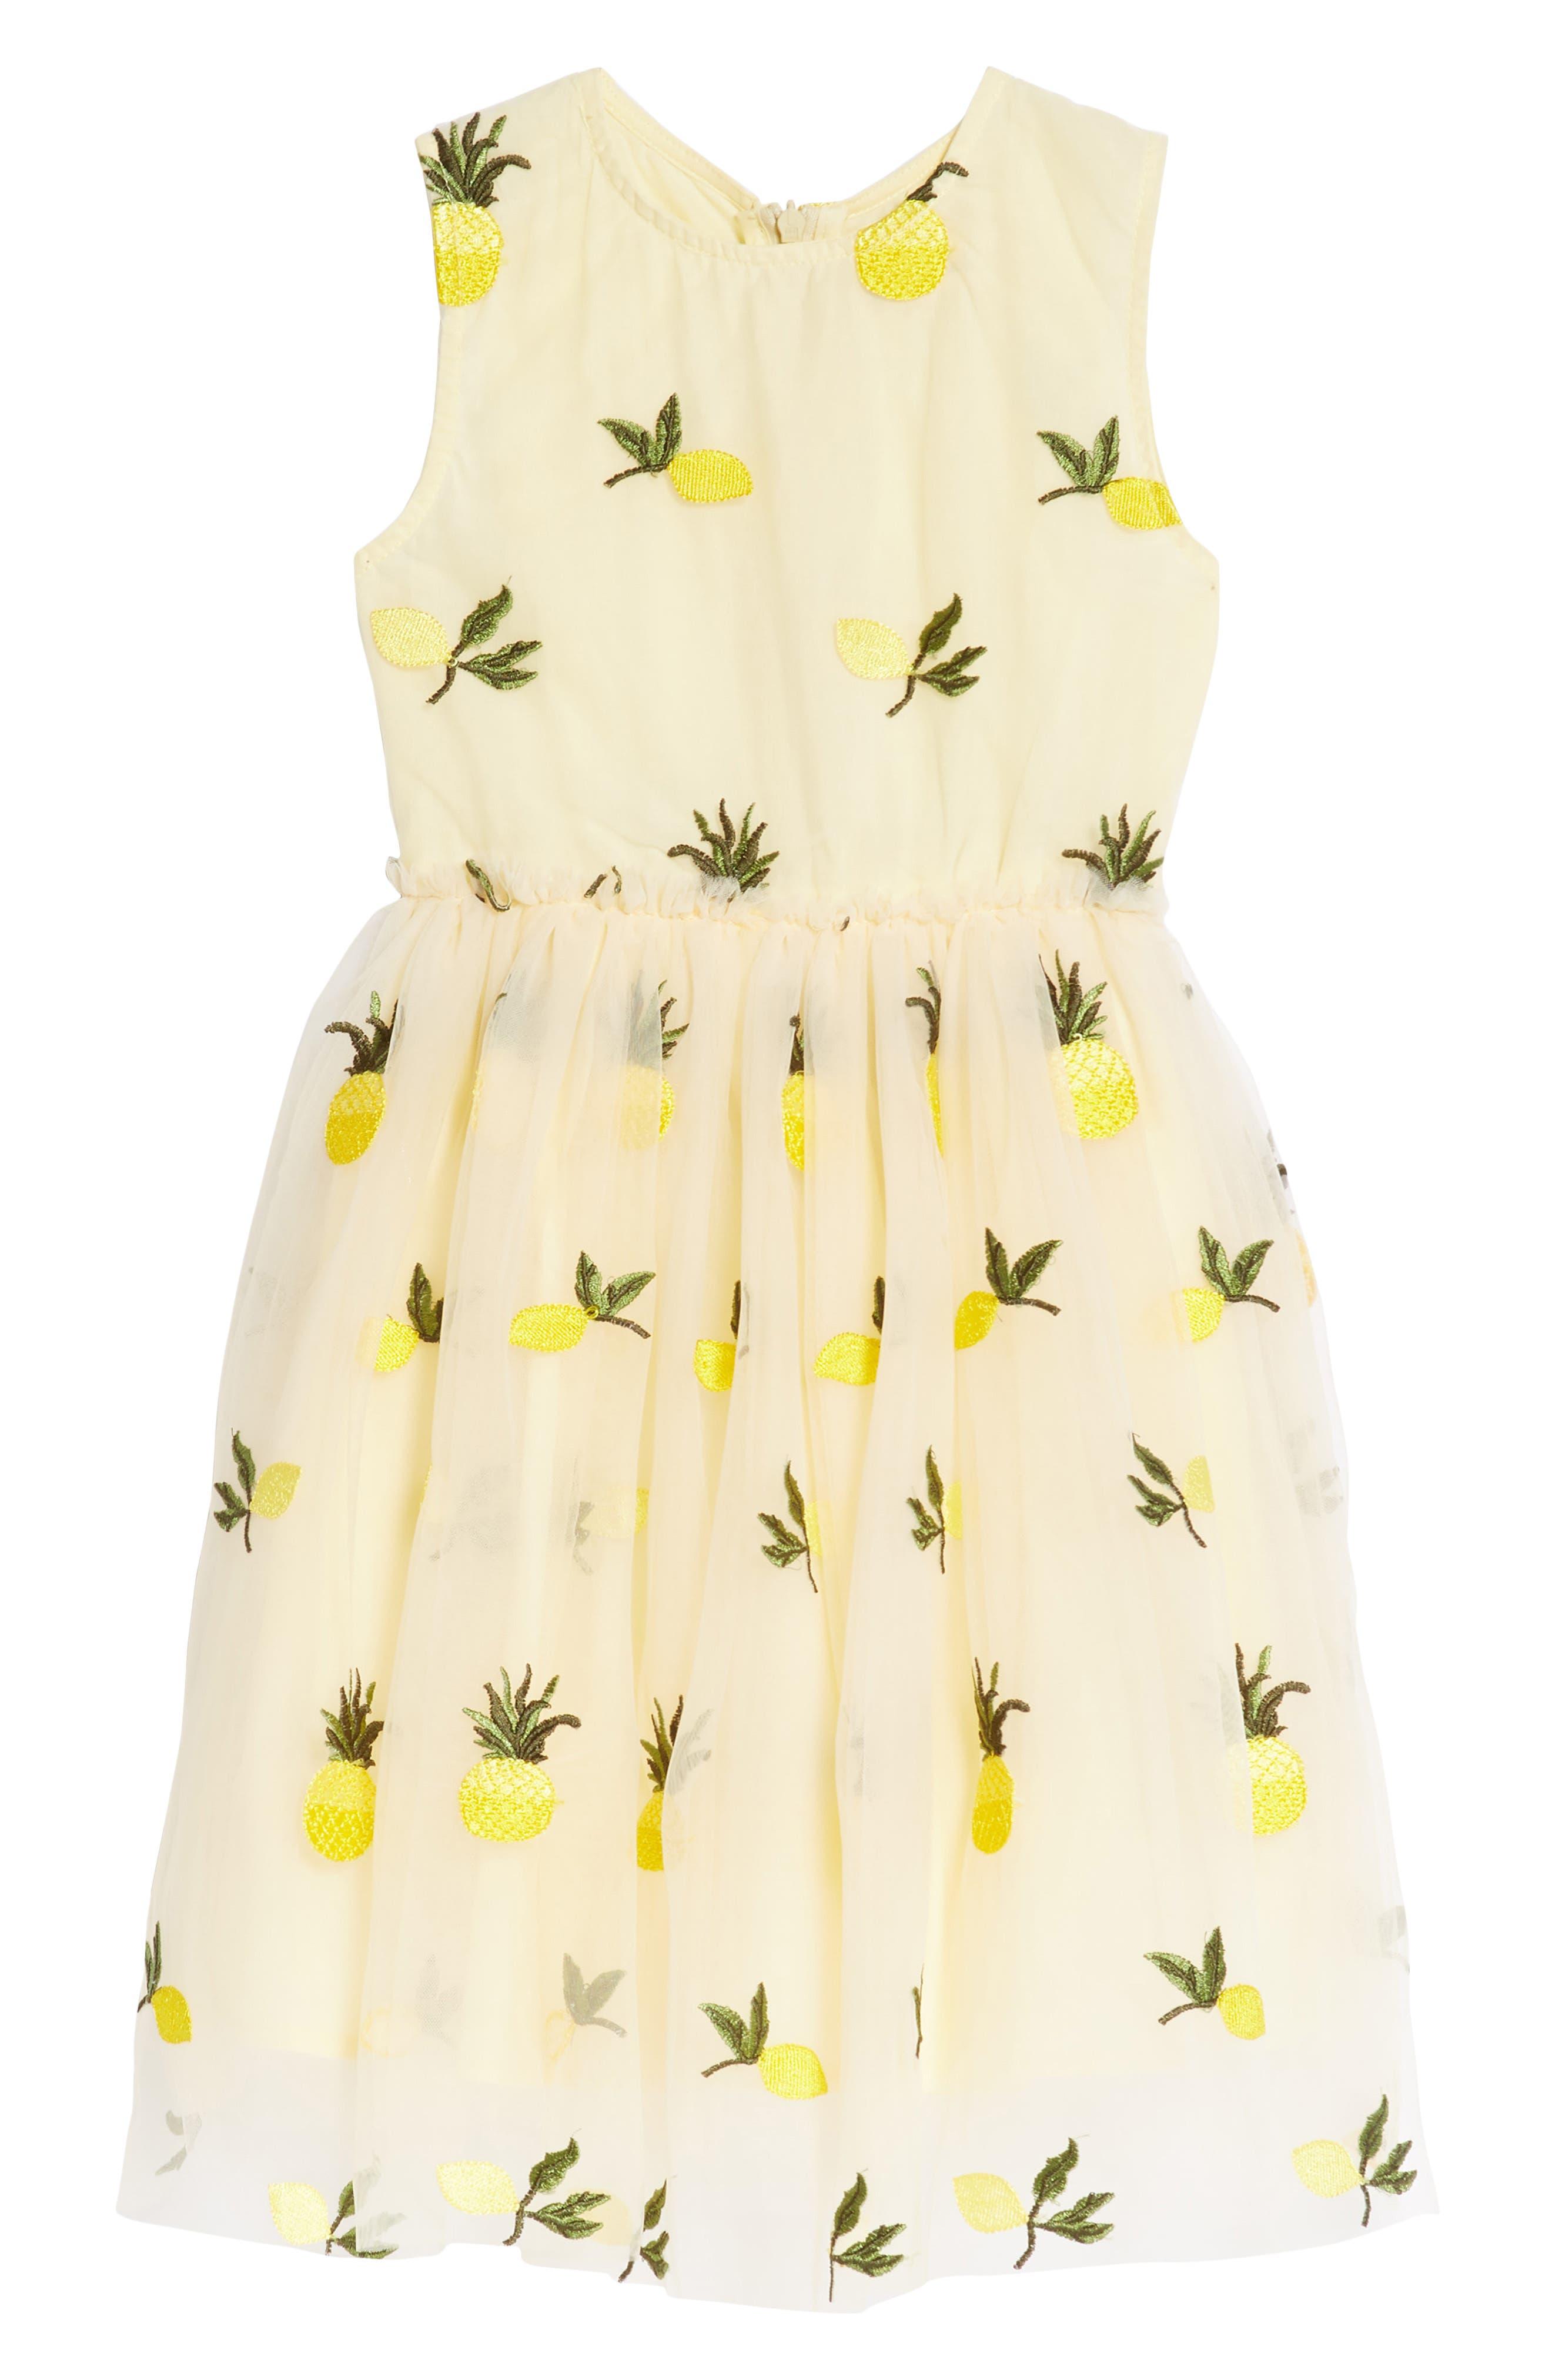 Pineapple & Lemon Embroidered Dress,                             Main thumbnail 1, color,                             250